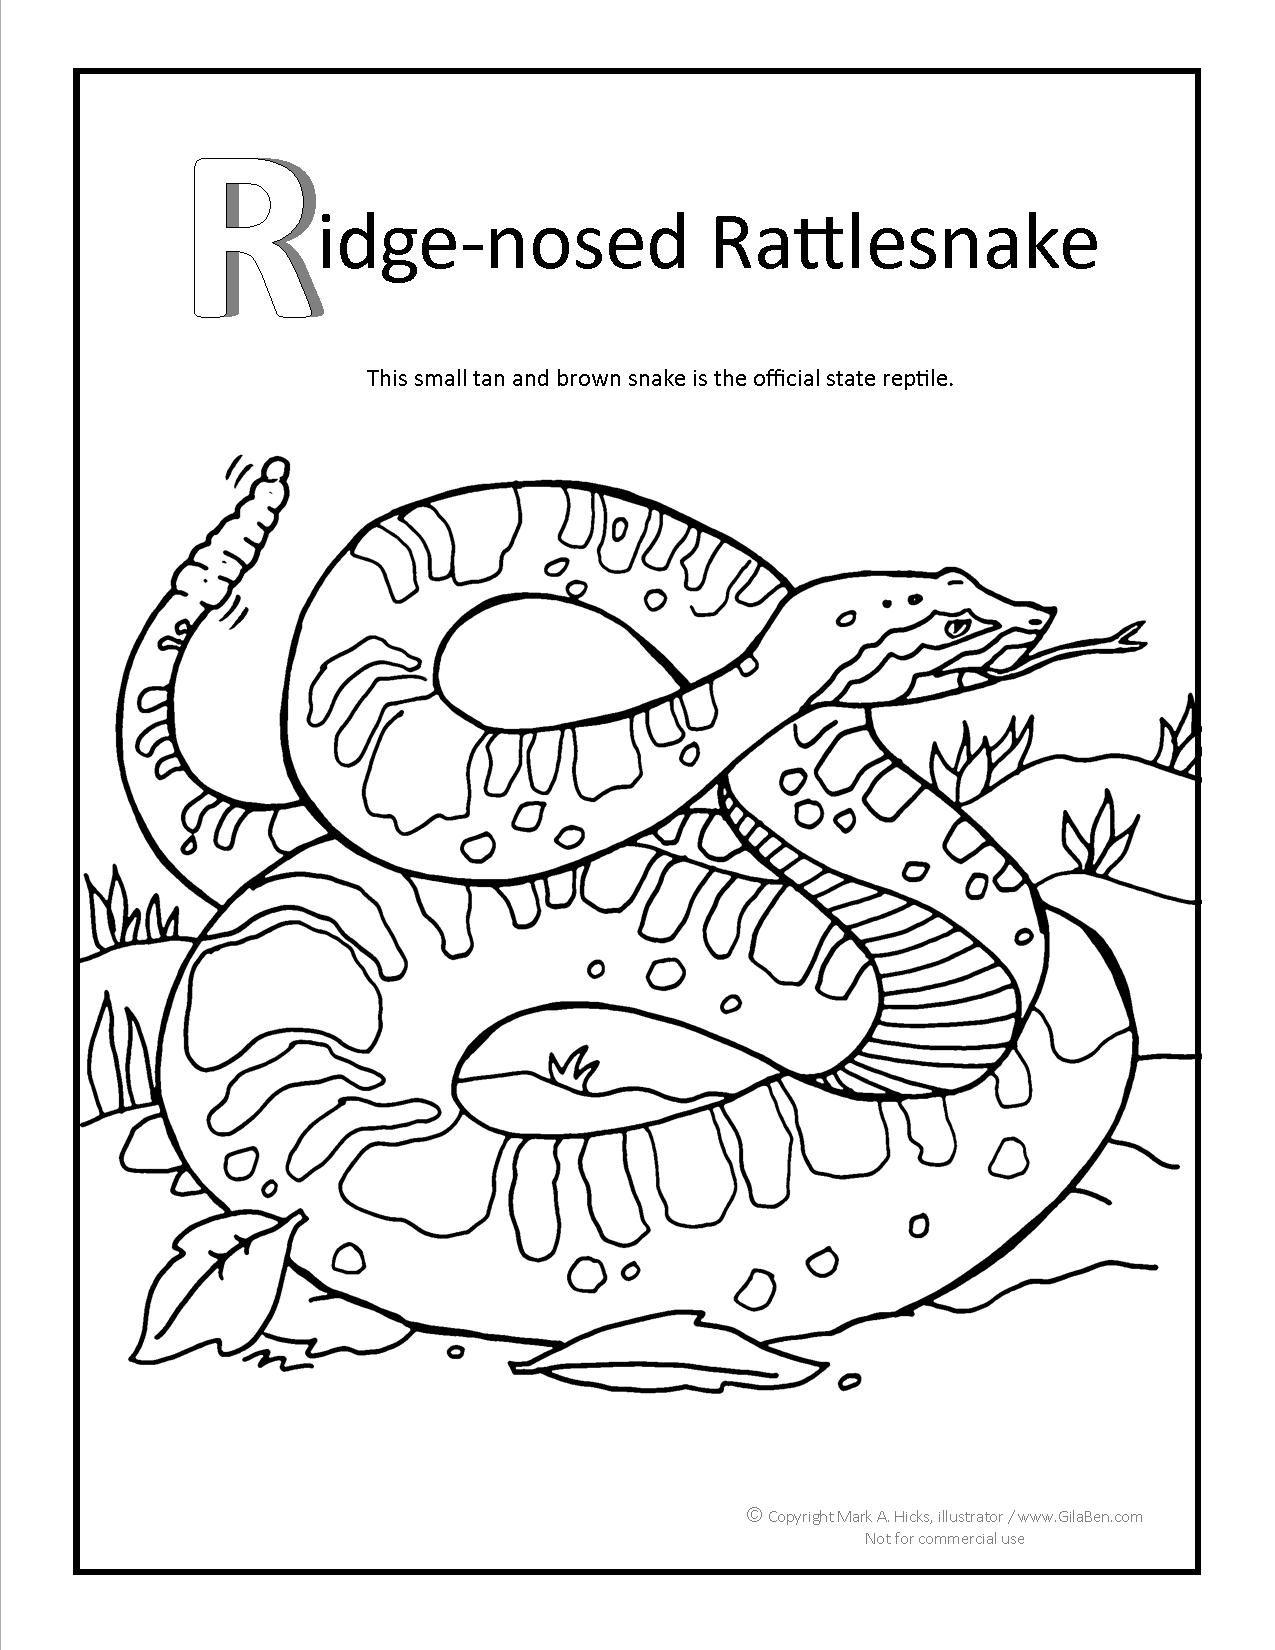 Ridge Nosed Rattlesnake Coloring Page At Gilaben